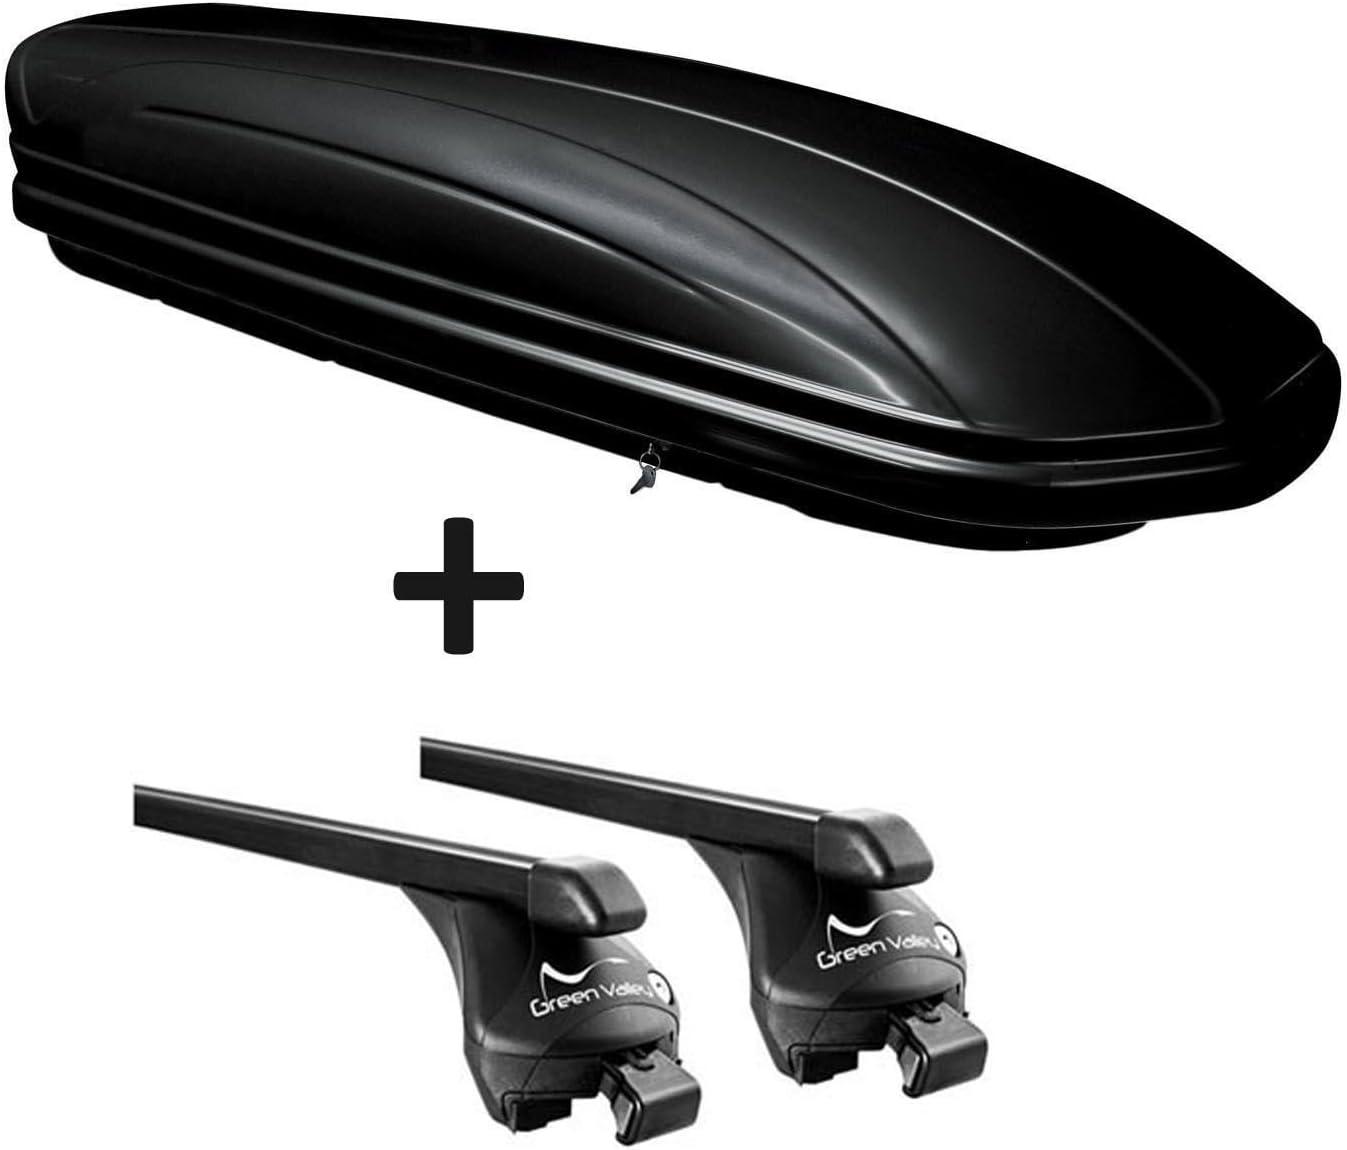 Dachbox VDPMAA320 320Ltr abschlie/ßbar schwarz ab 2017 offene Reling SUV 5 T/ürer Relingtr/äger Quick kompatibel mit Skoda Kodiaq